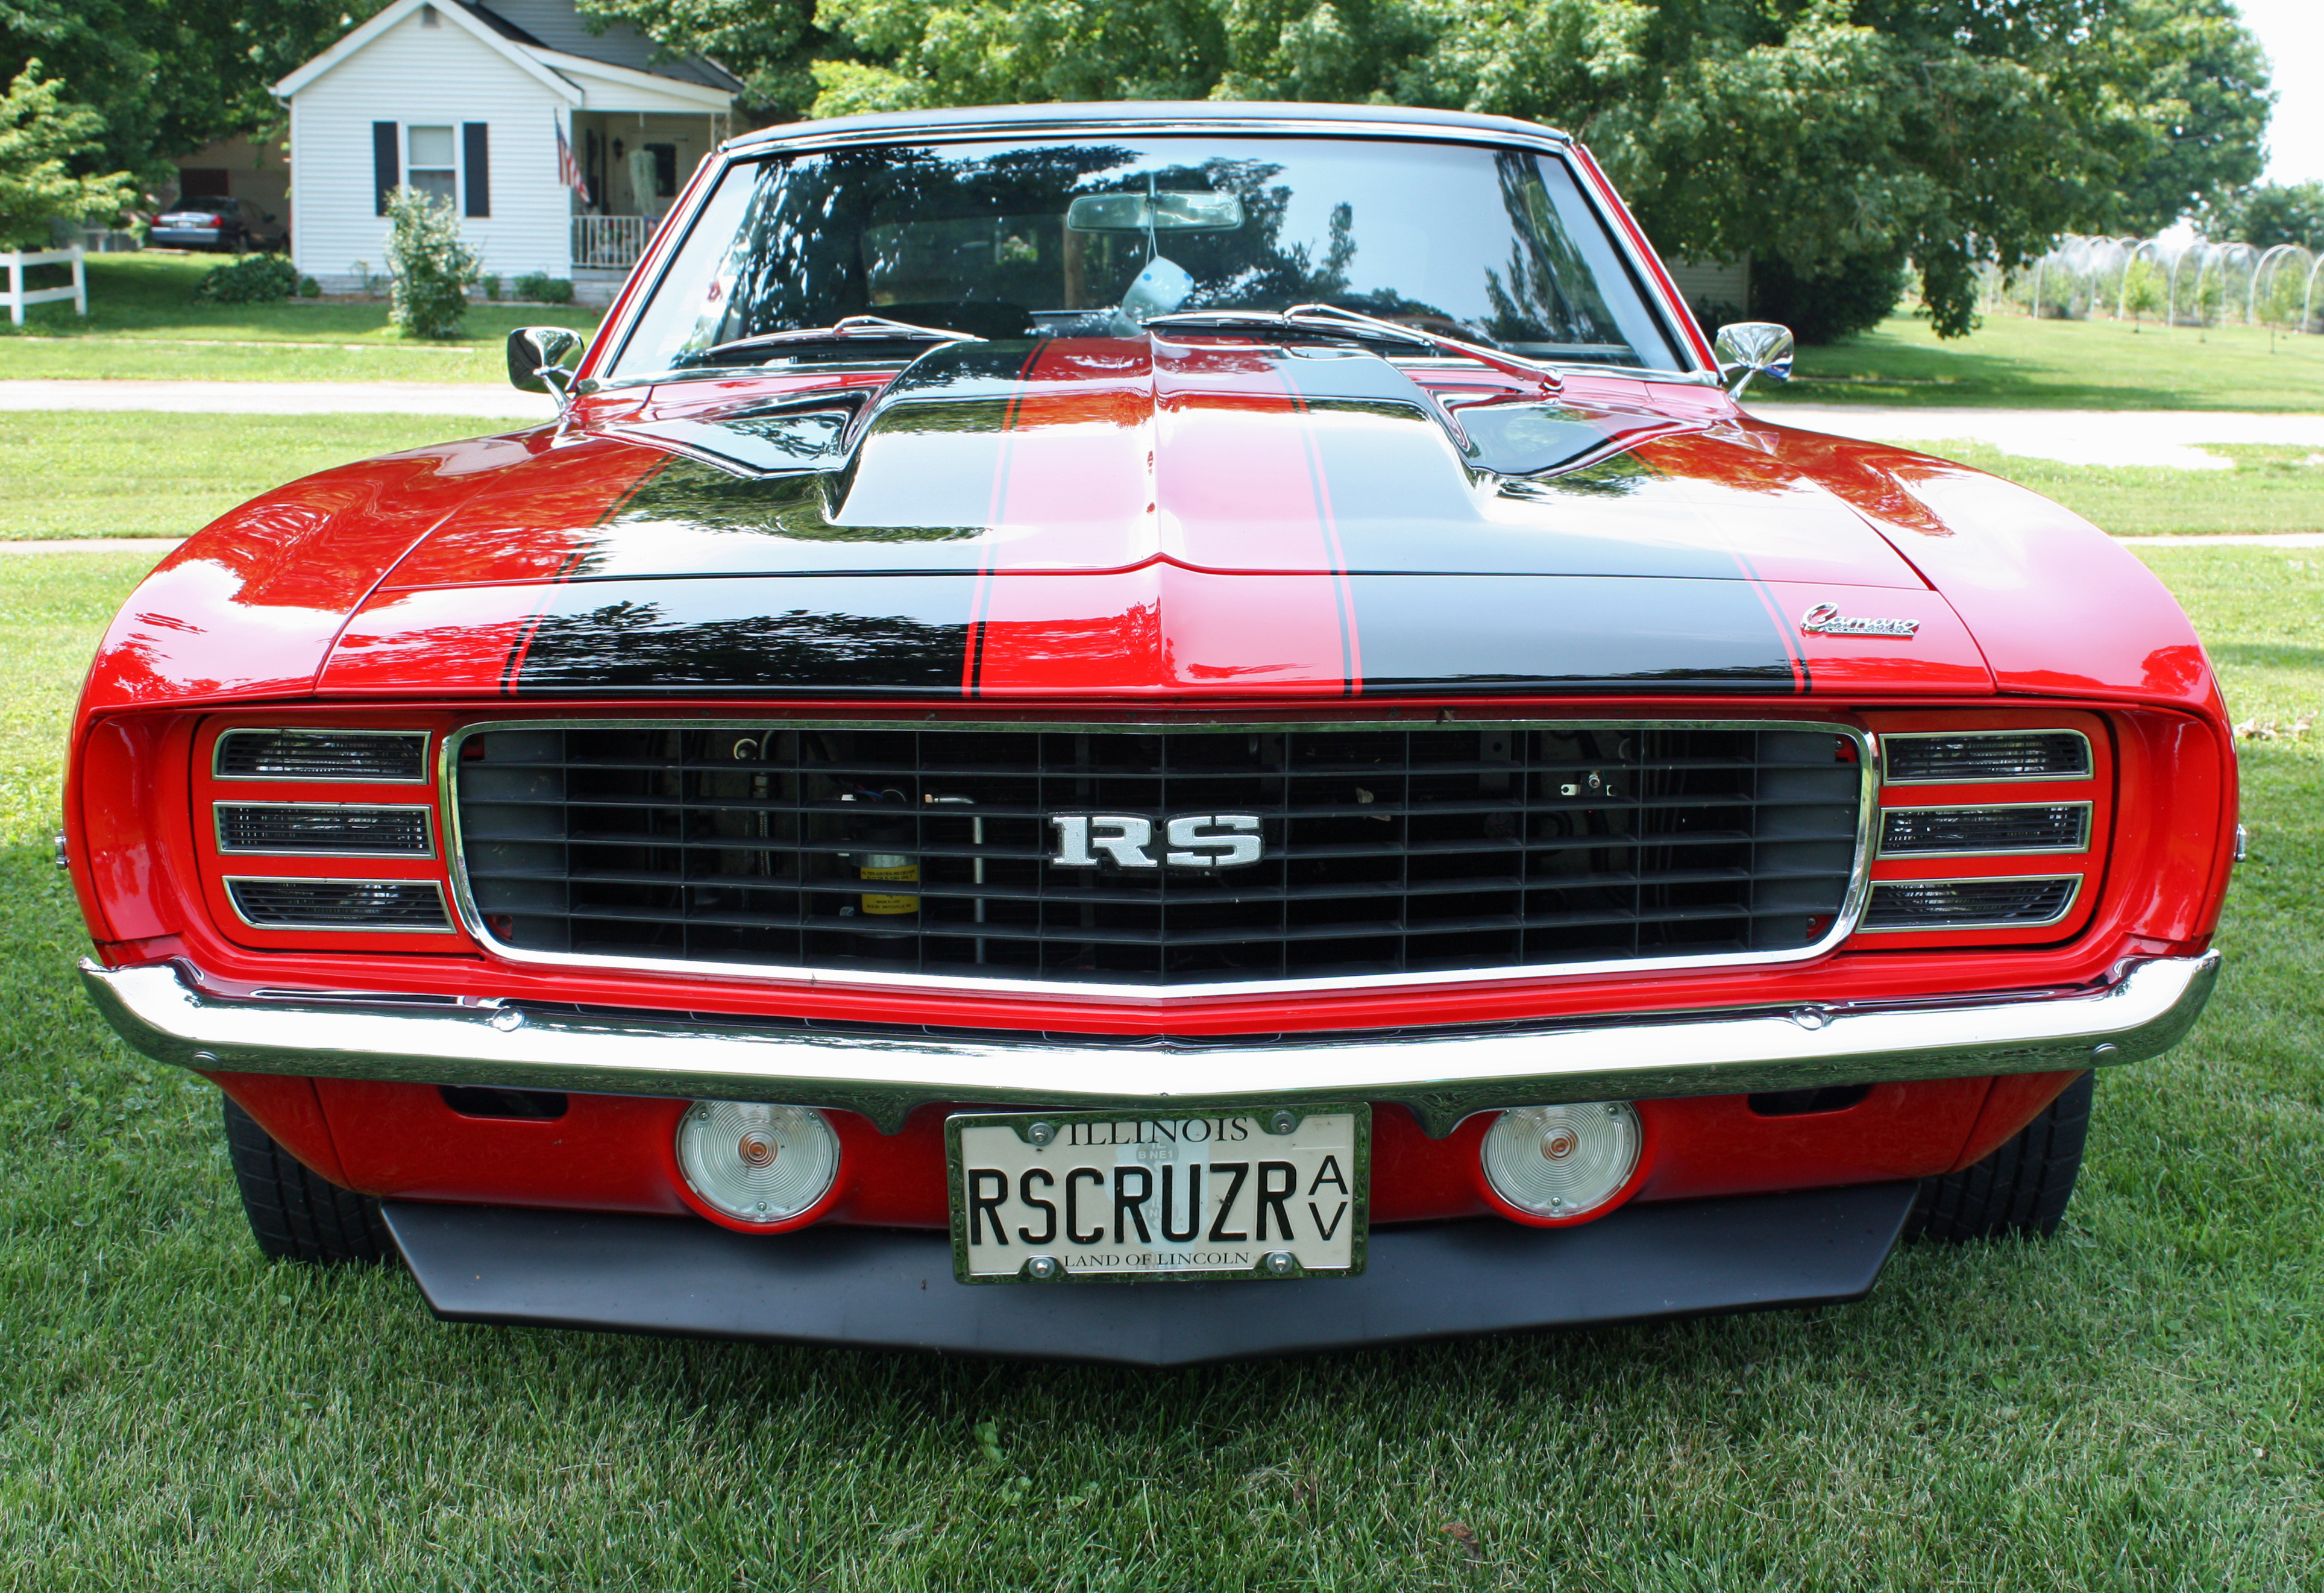 1960 1969 mopar muscle cars for sale autos post. Black Bedroom Furniture Sets. Home Design Ideas